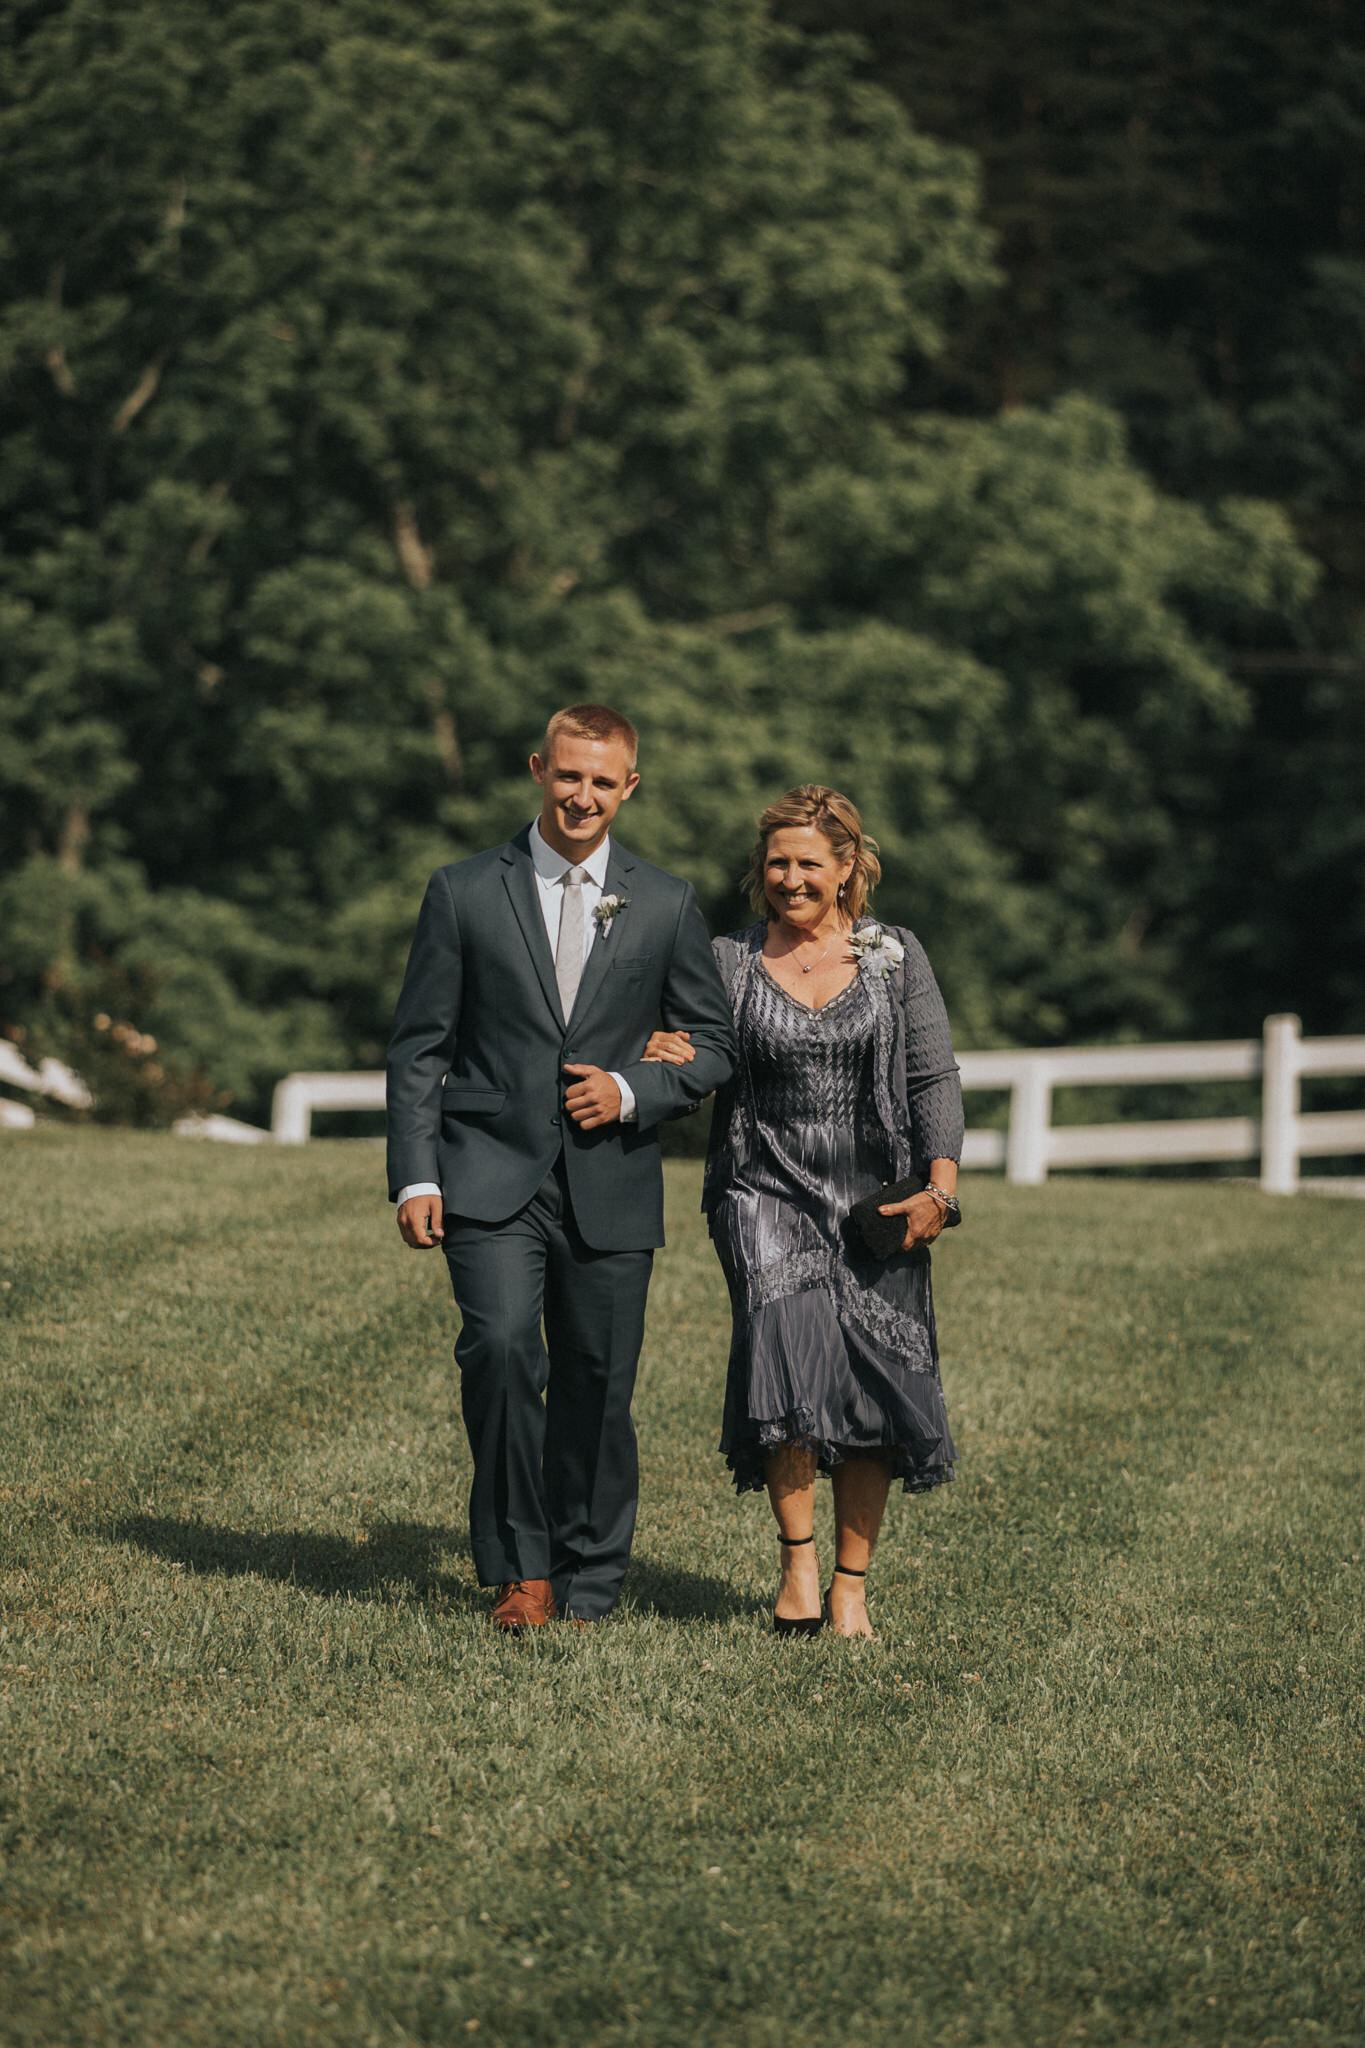 KateMatt-North-Georgia-Wedding-Photographer-Mountain-Laurel-Farm-91.jpg